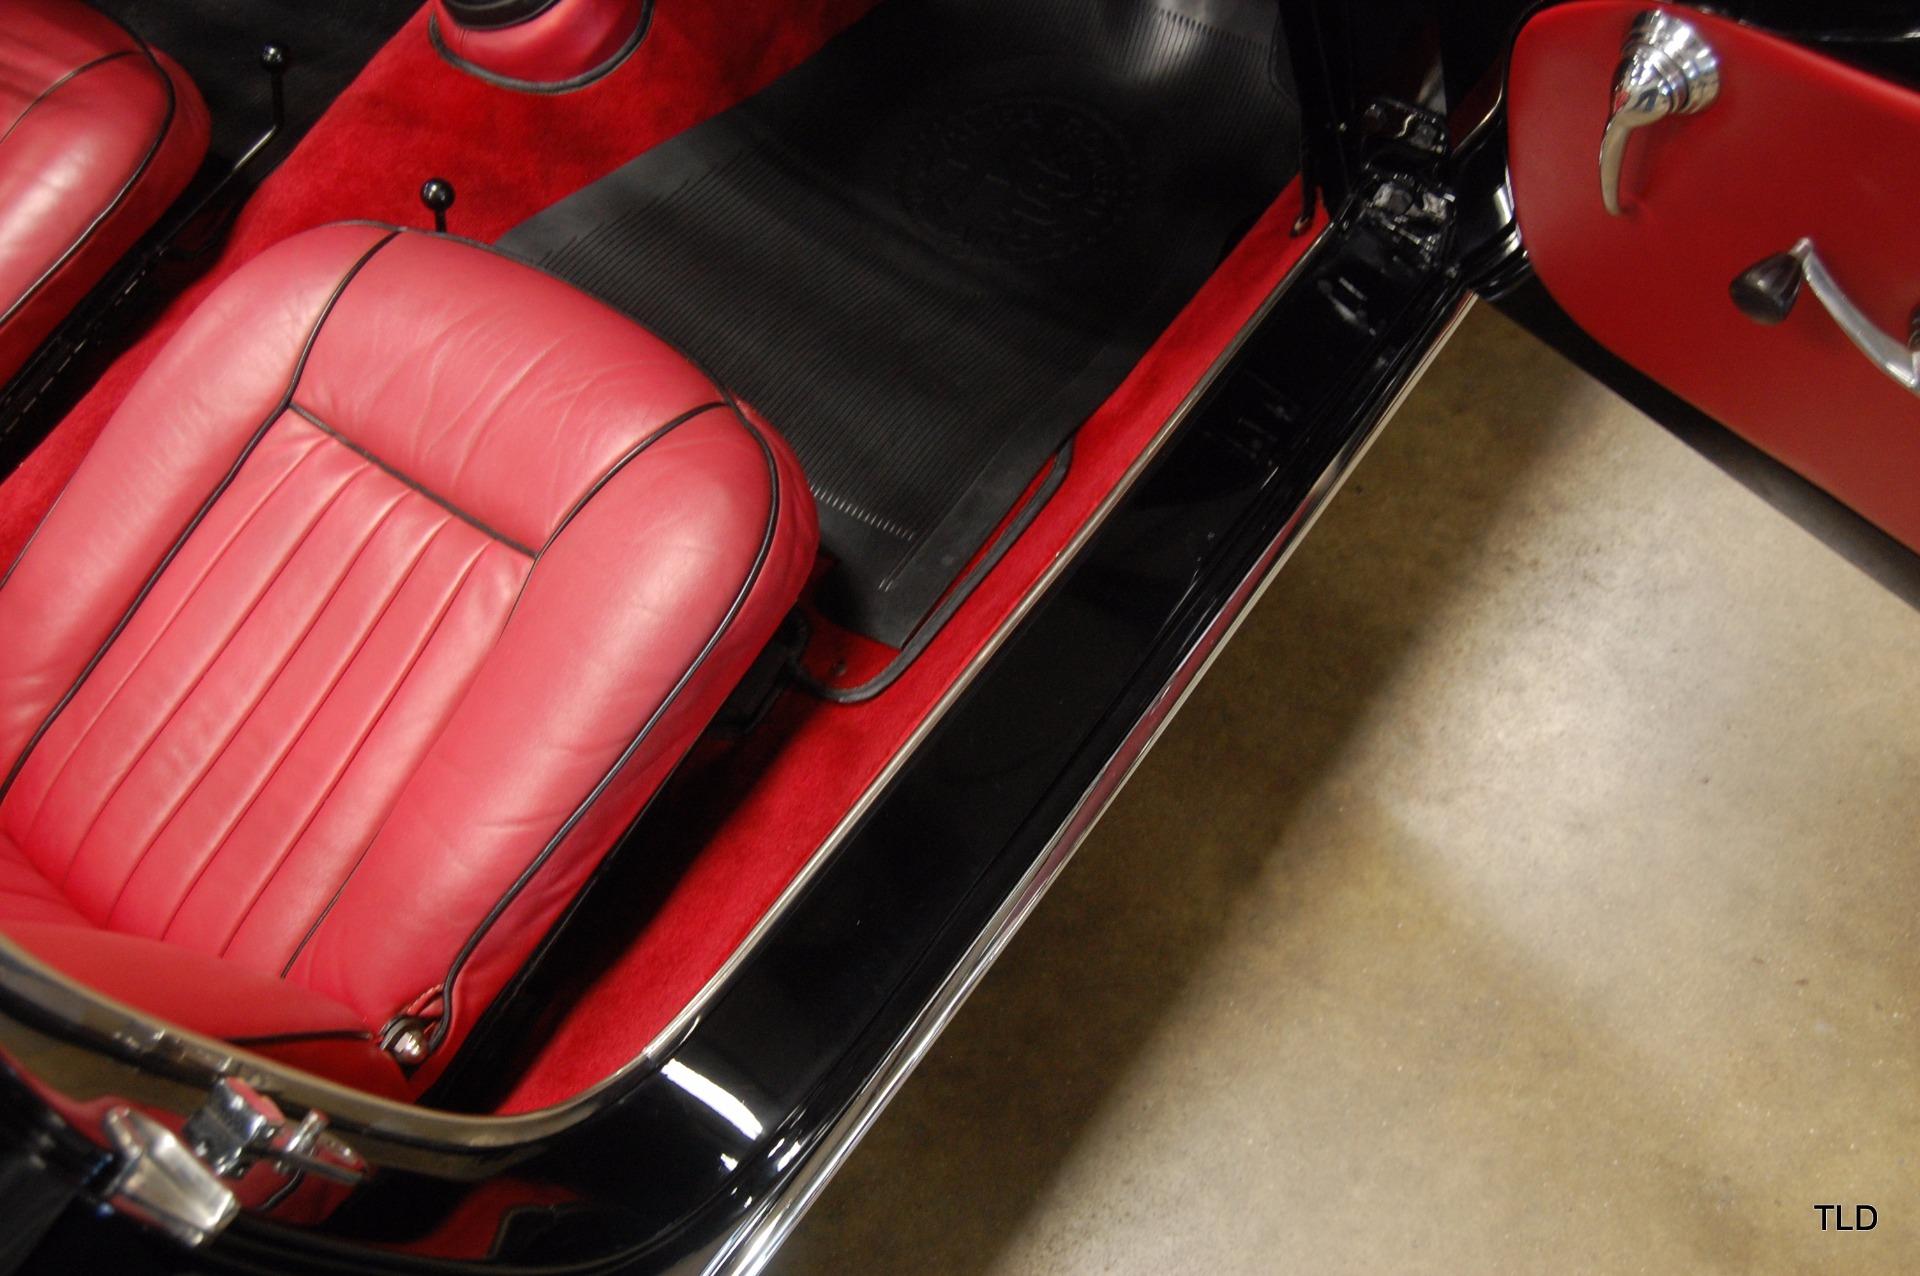 1959 Alfa Romeo Giulietta 750 Spider Veloce: 1959 Alfa Romeo Giulietta 750